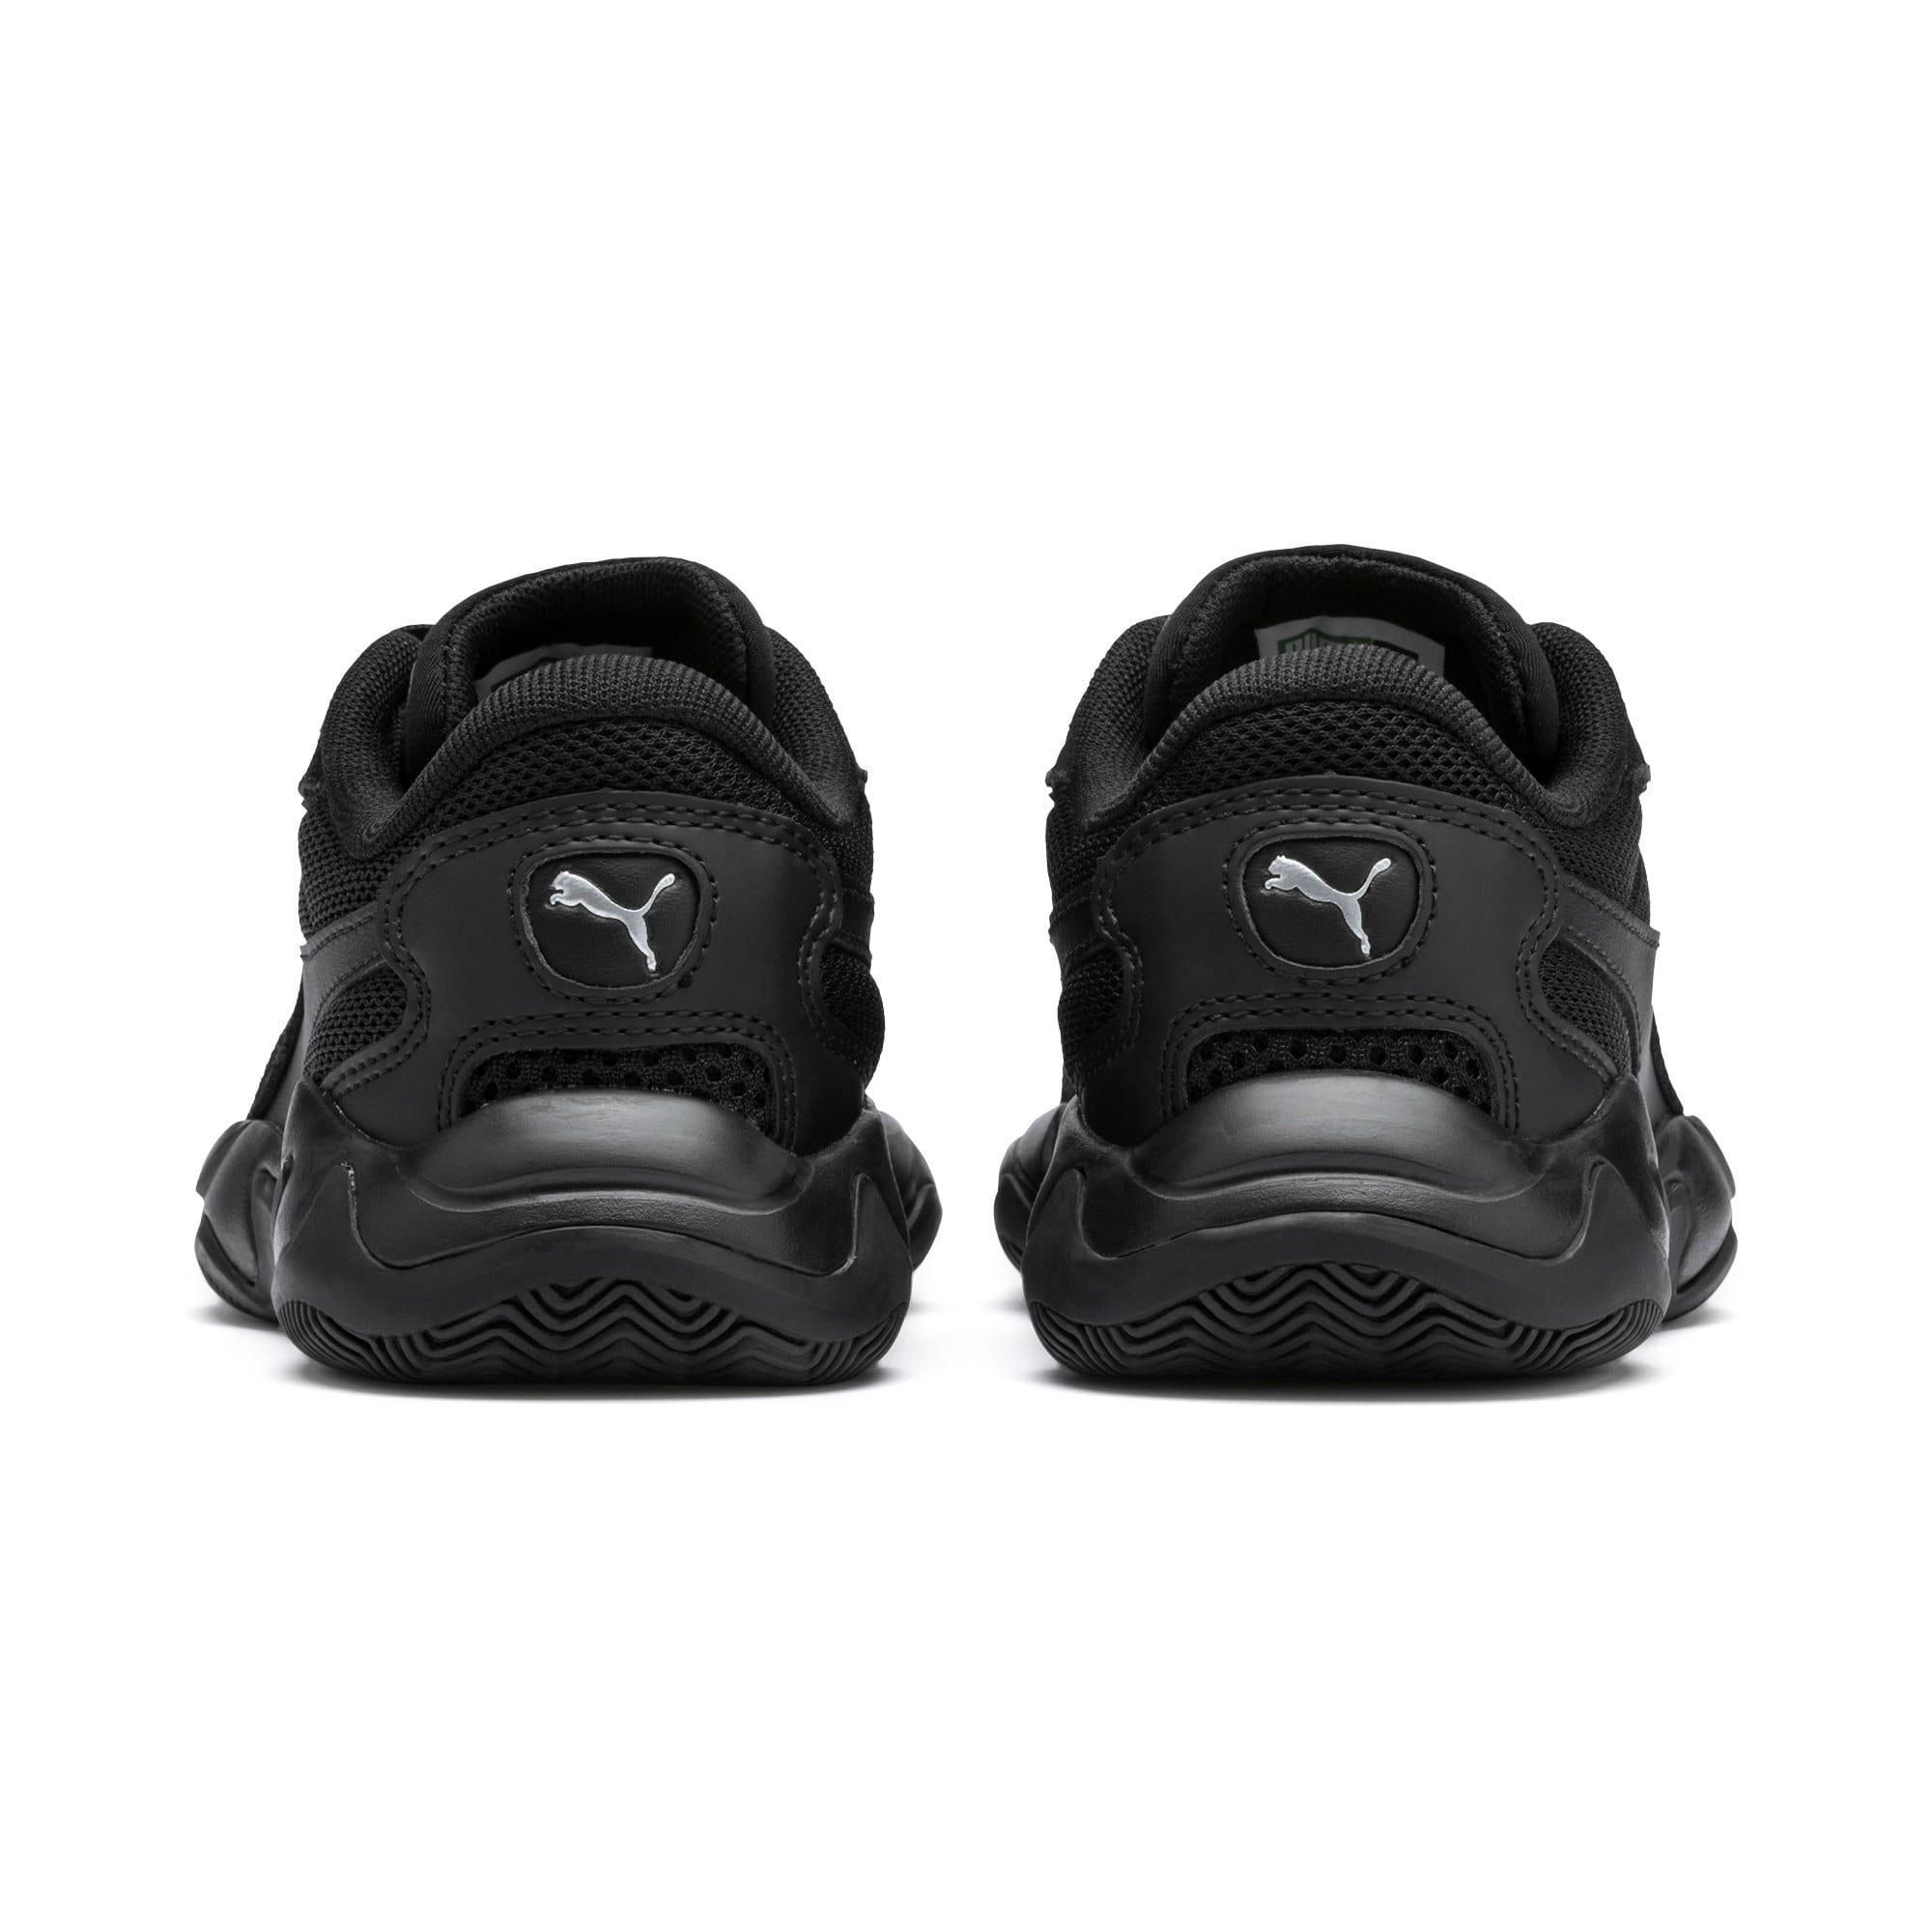 Thumbnail 3 of Storm Origin Kids Sneaker, Puma Black, medium